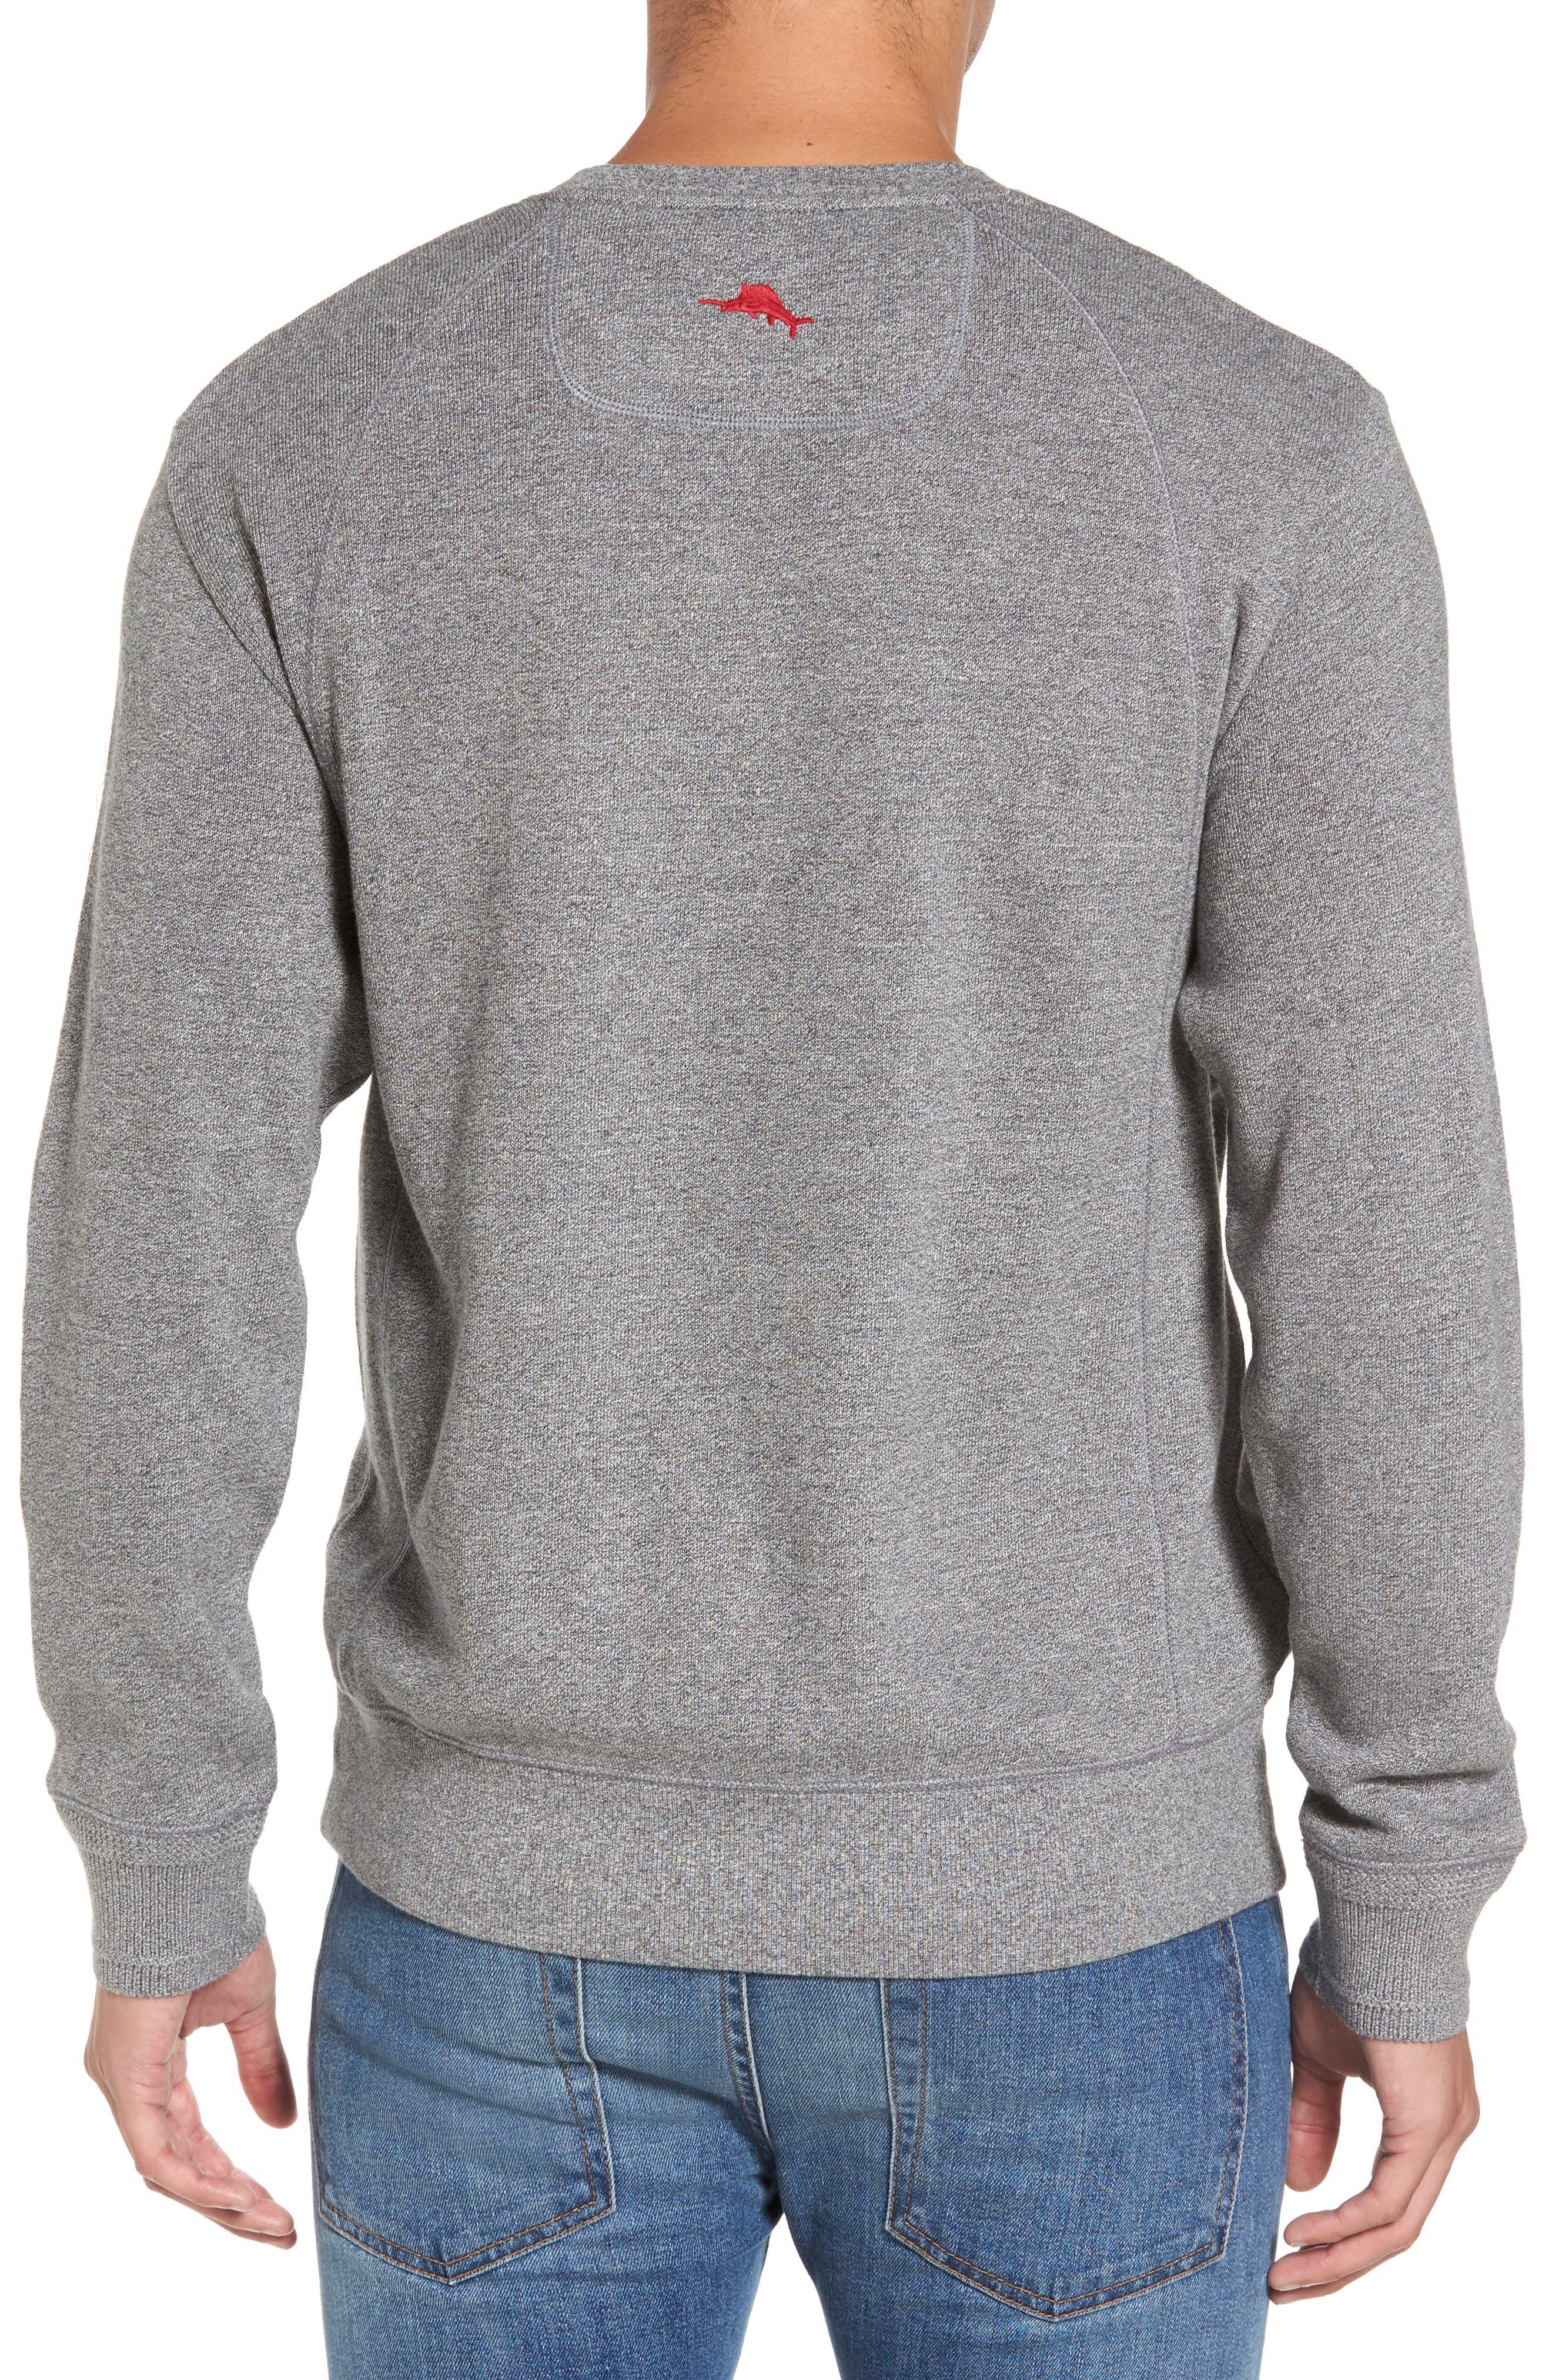 NFL Stitch of Liberty Embroidered Crewneck Sweatshirt,                             Alternate thumbnail 34, color,